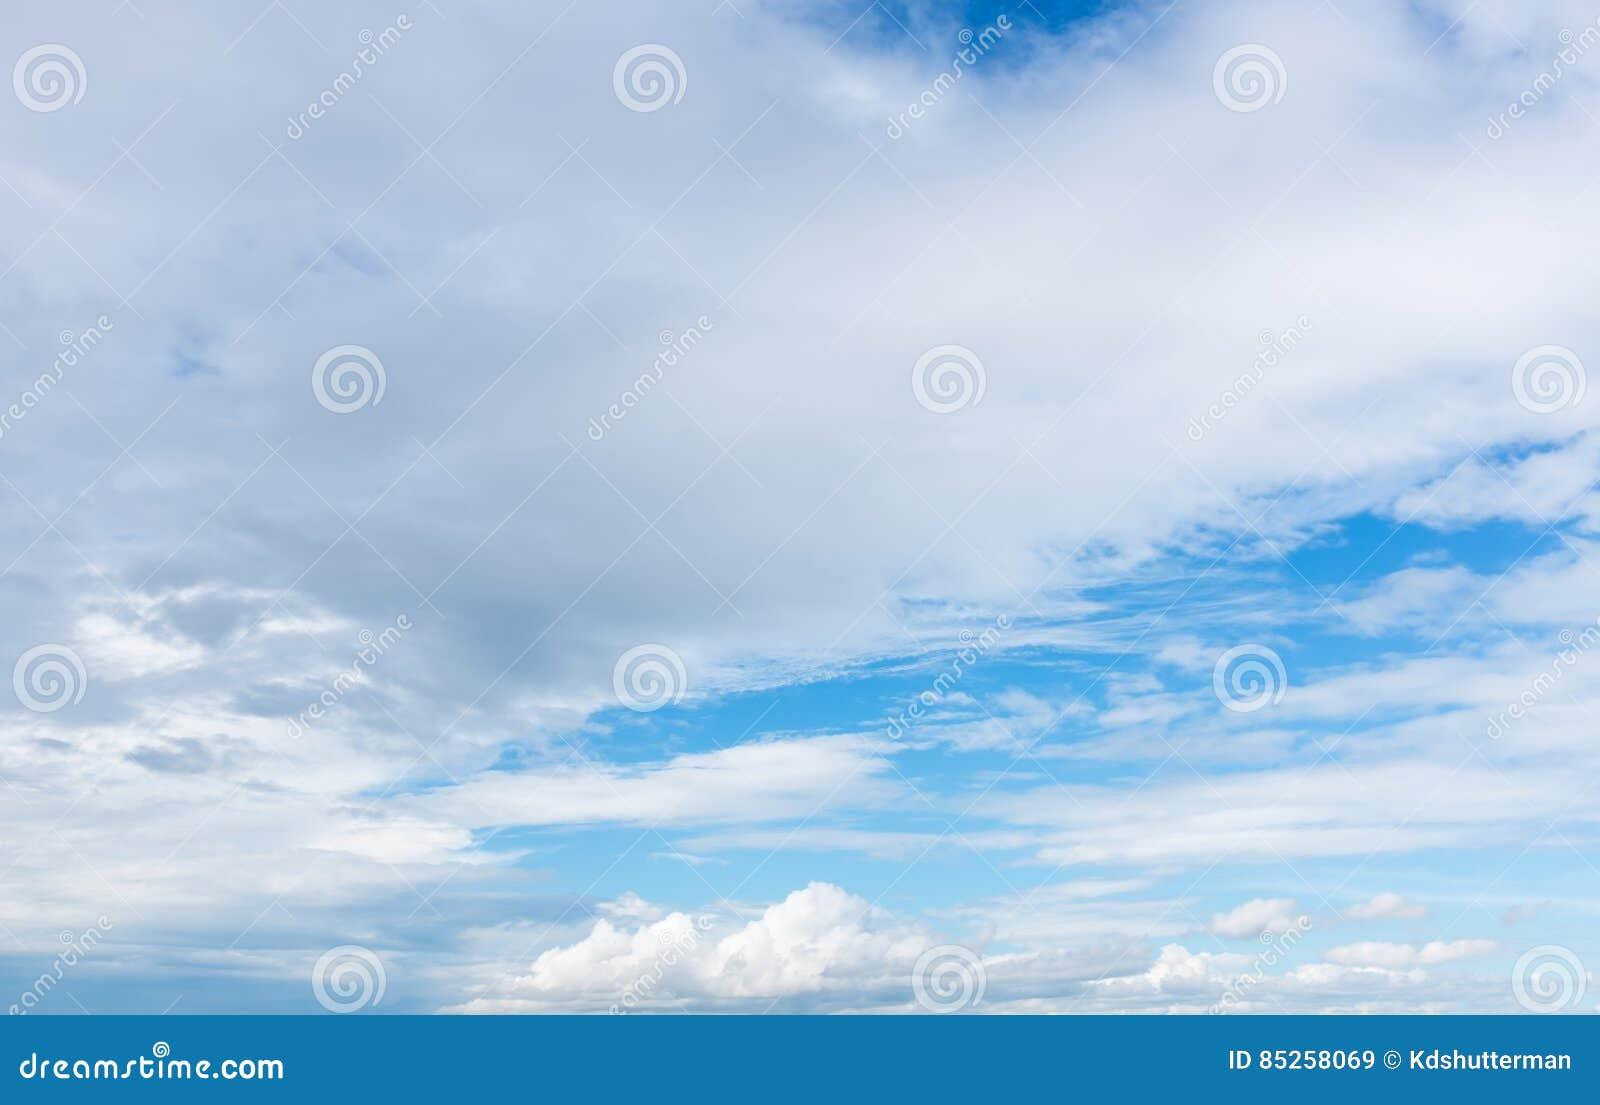 Cielo azul hermoso con nublado Fondo de la naturaleza outdoors